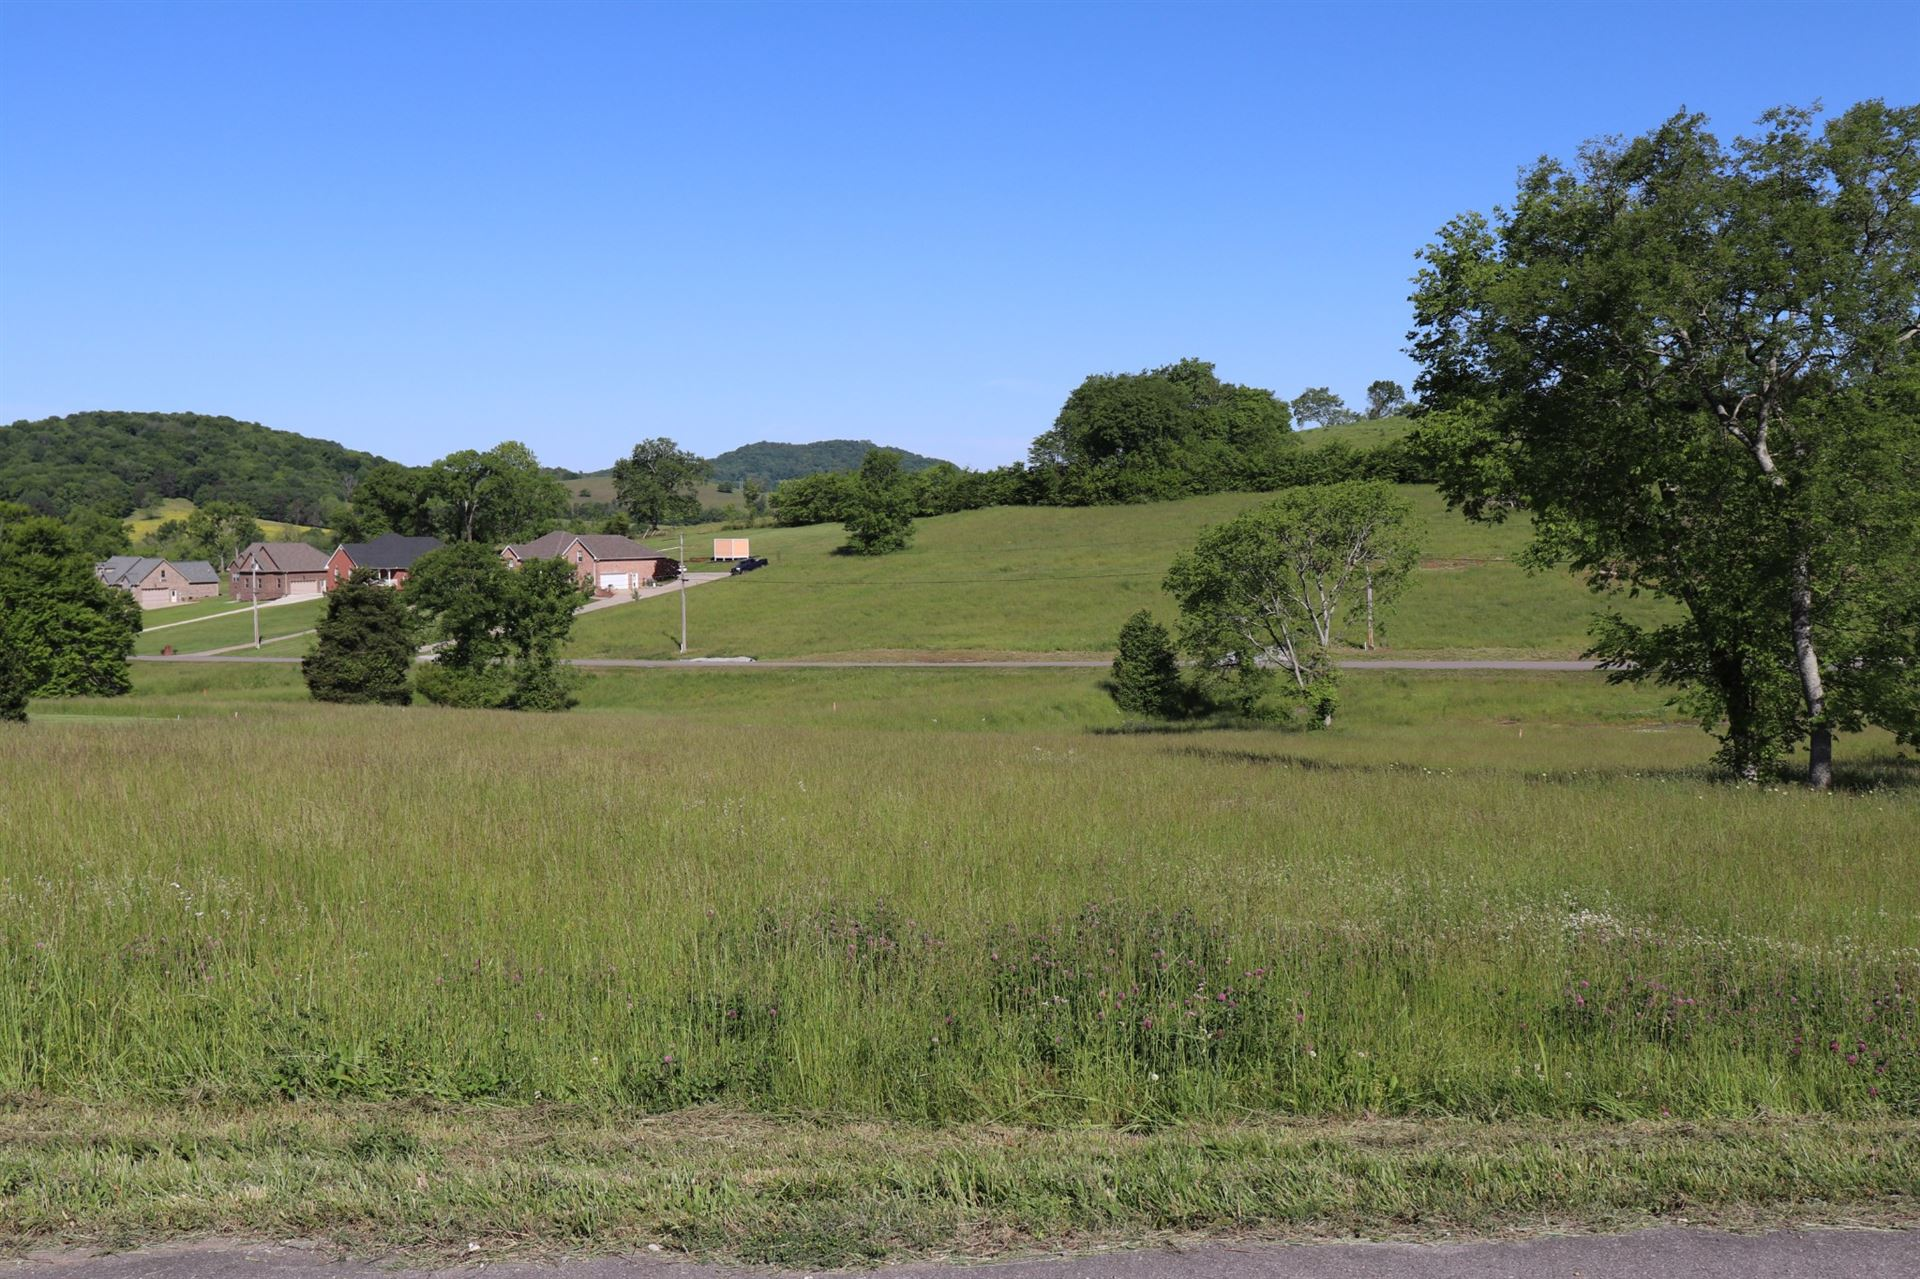 Photo of 0 Bridle Path Ln, Hartsville, TN 37074 (MLS # 2253605)